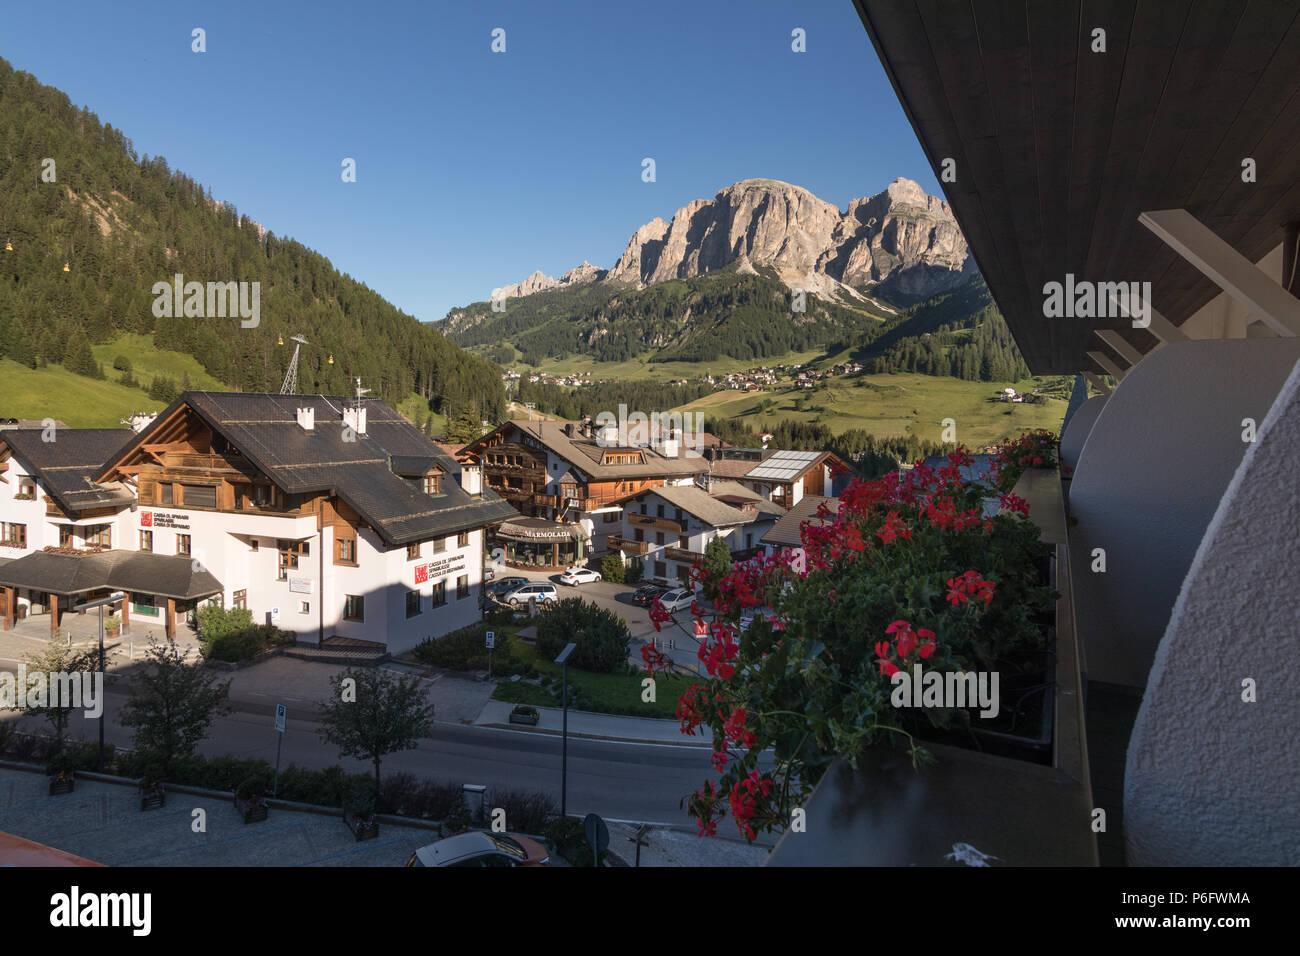 Posta Zirm Hotel Corvara in Badia South Tyrol Trentino Alto Adige Italy - Stock Image